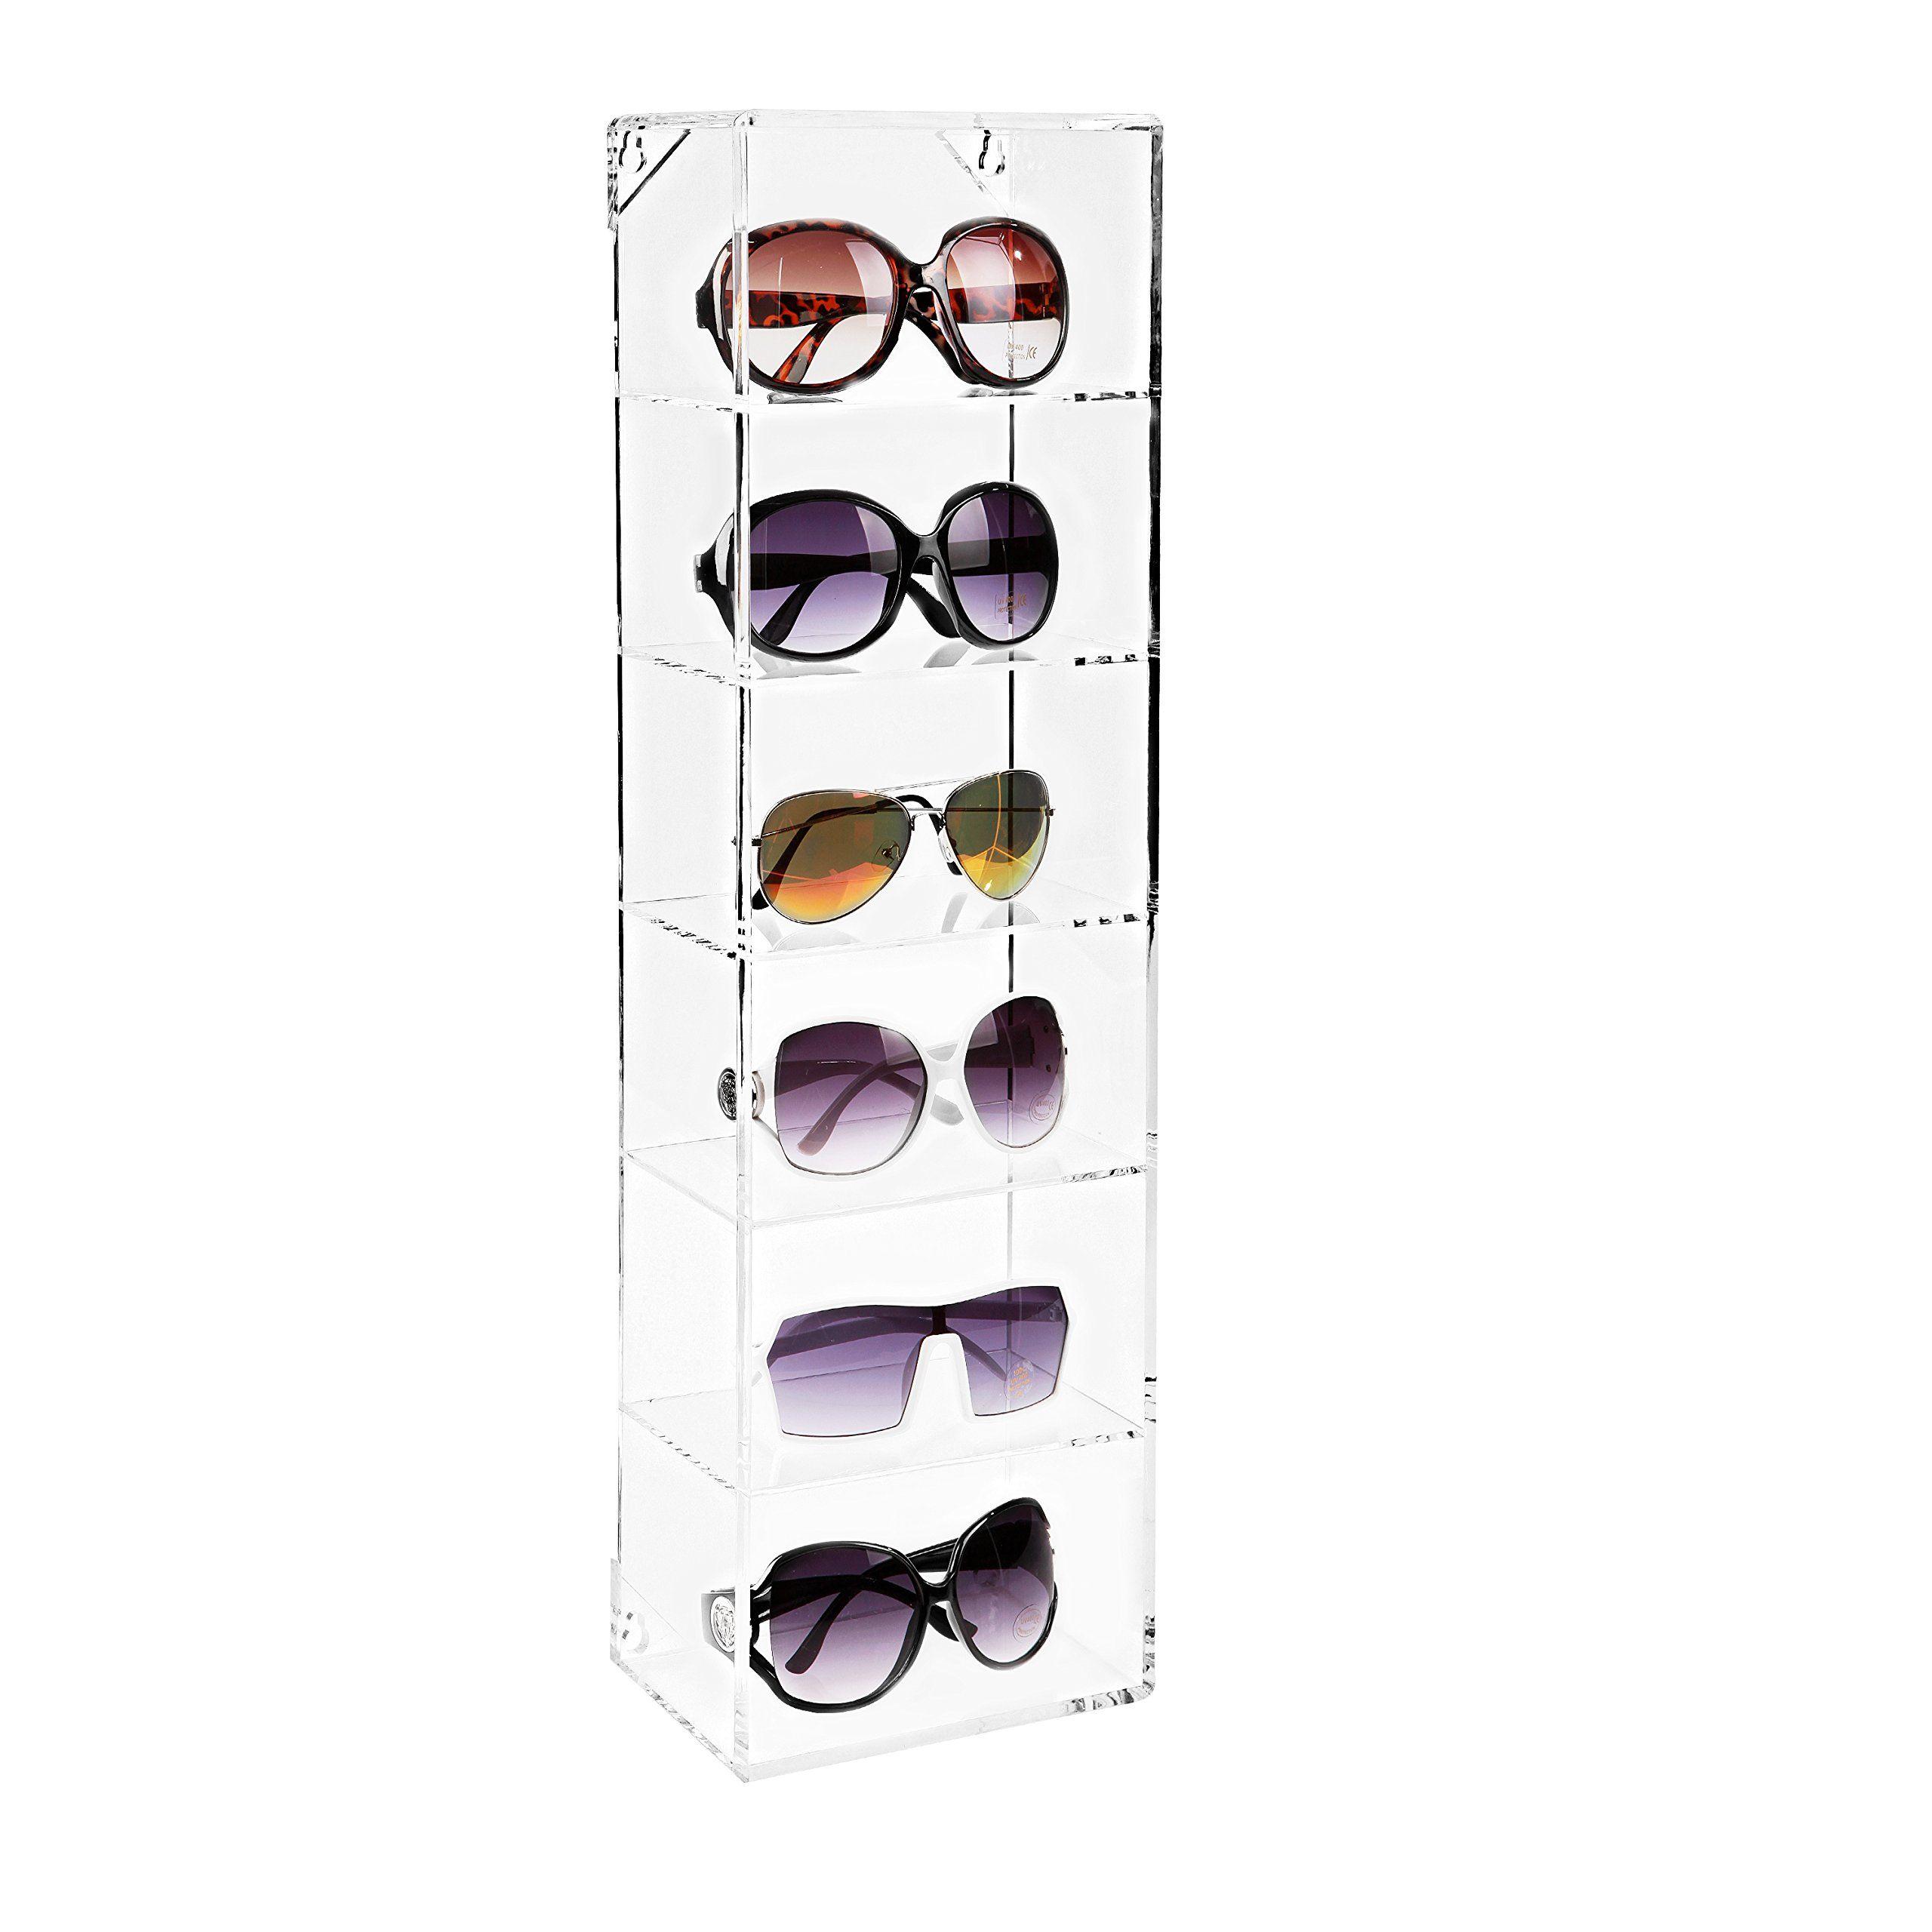 5 Pair Sunglasses Glasses Fashion Hot Transparent Holder Stand Display